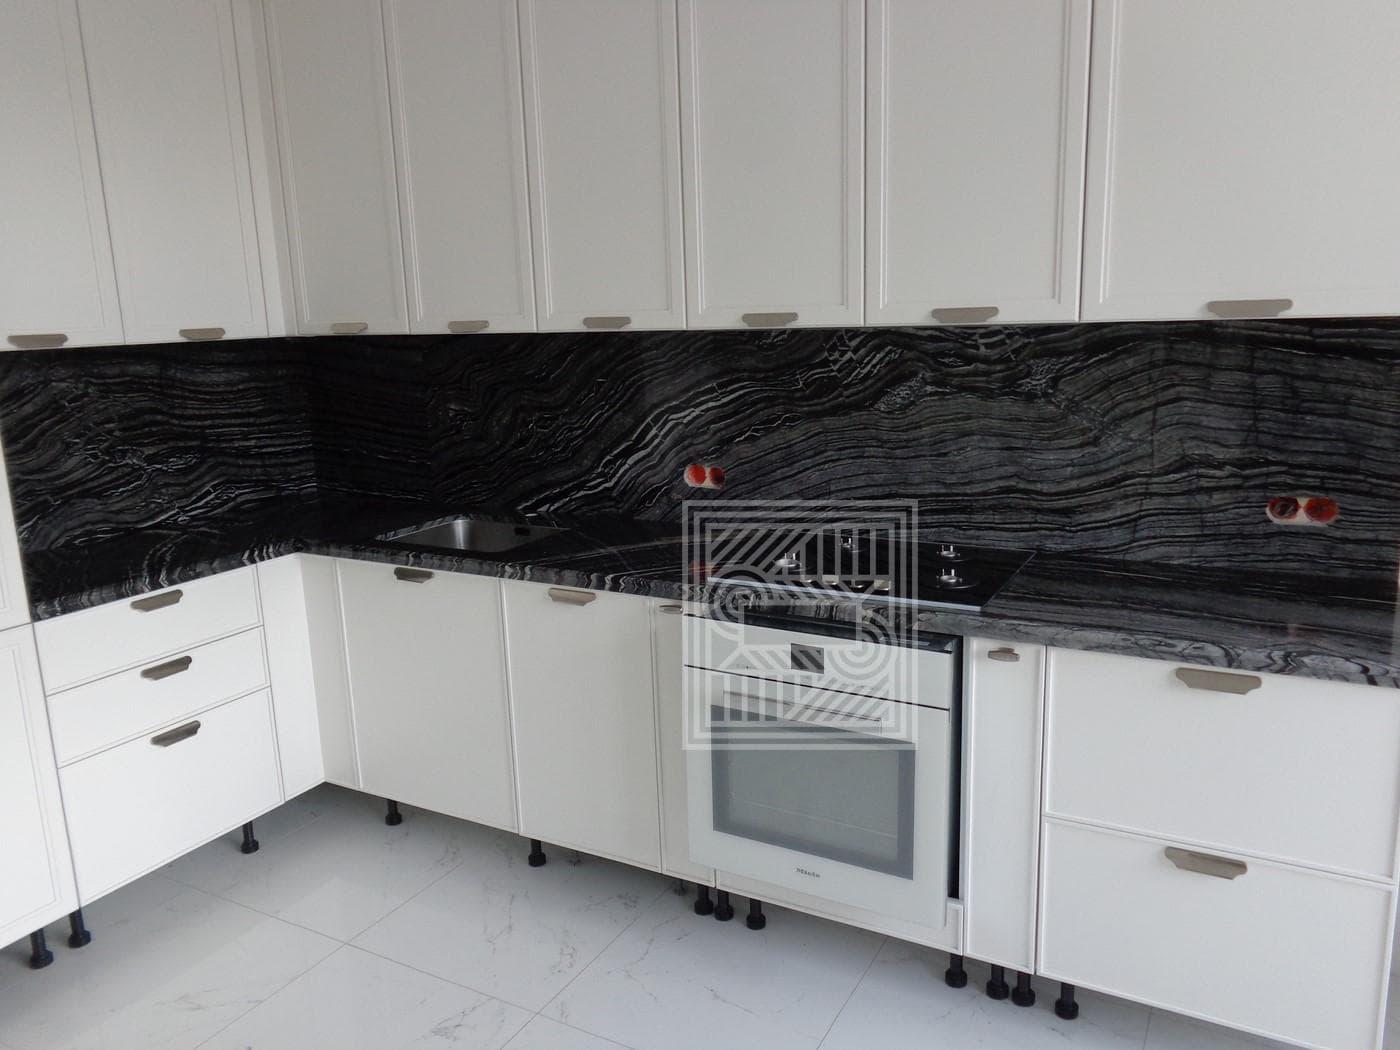 Кухонная столешница и фартук из мрамора Black Wood worktop-marble - Stoleshnitsa Black Wood